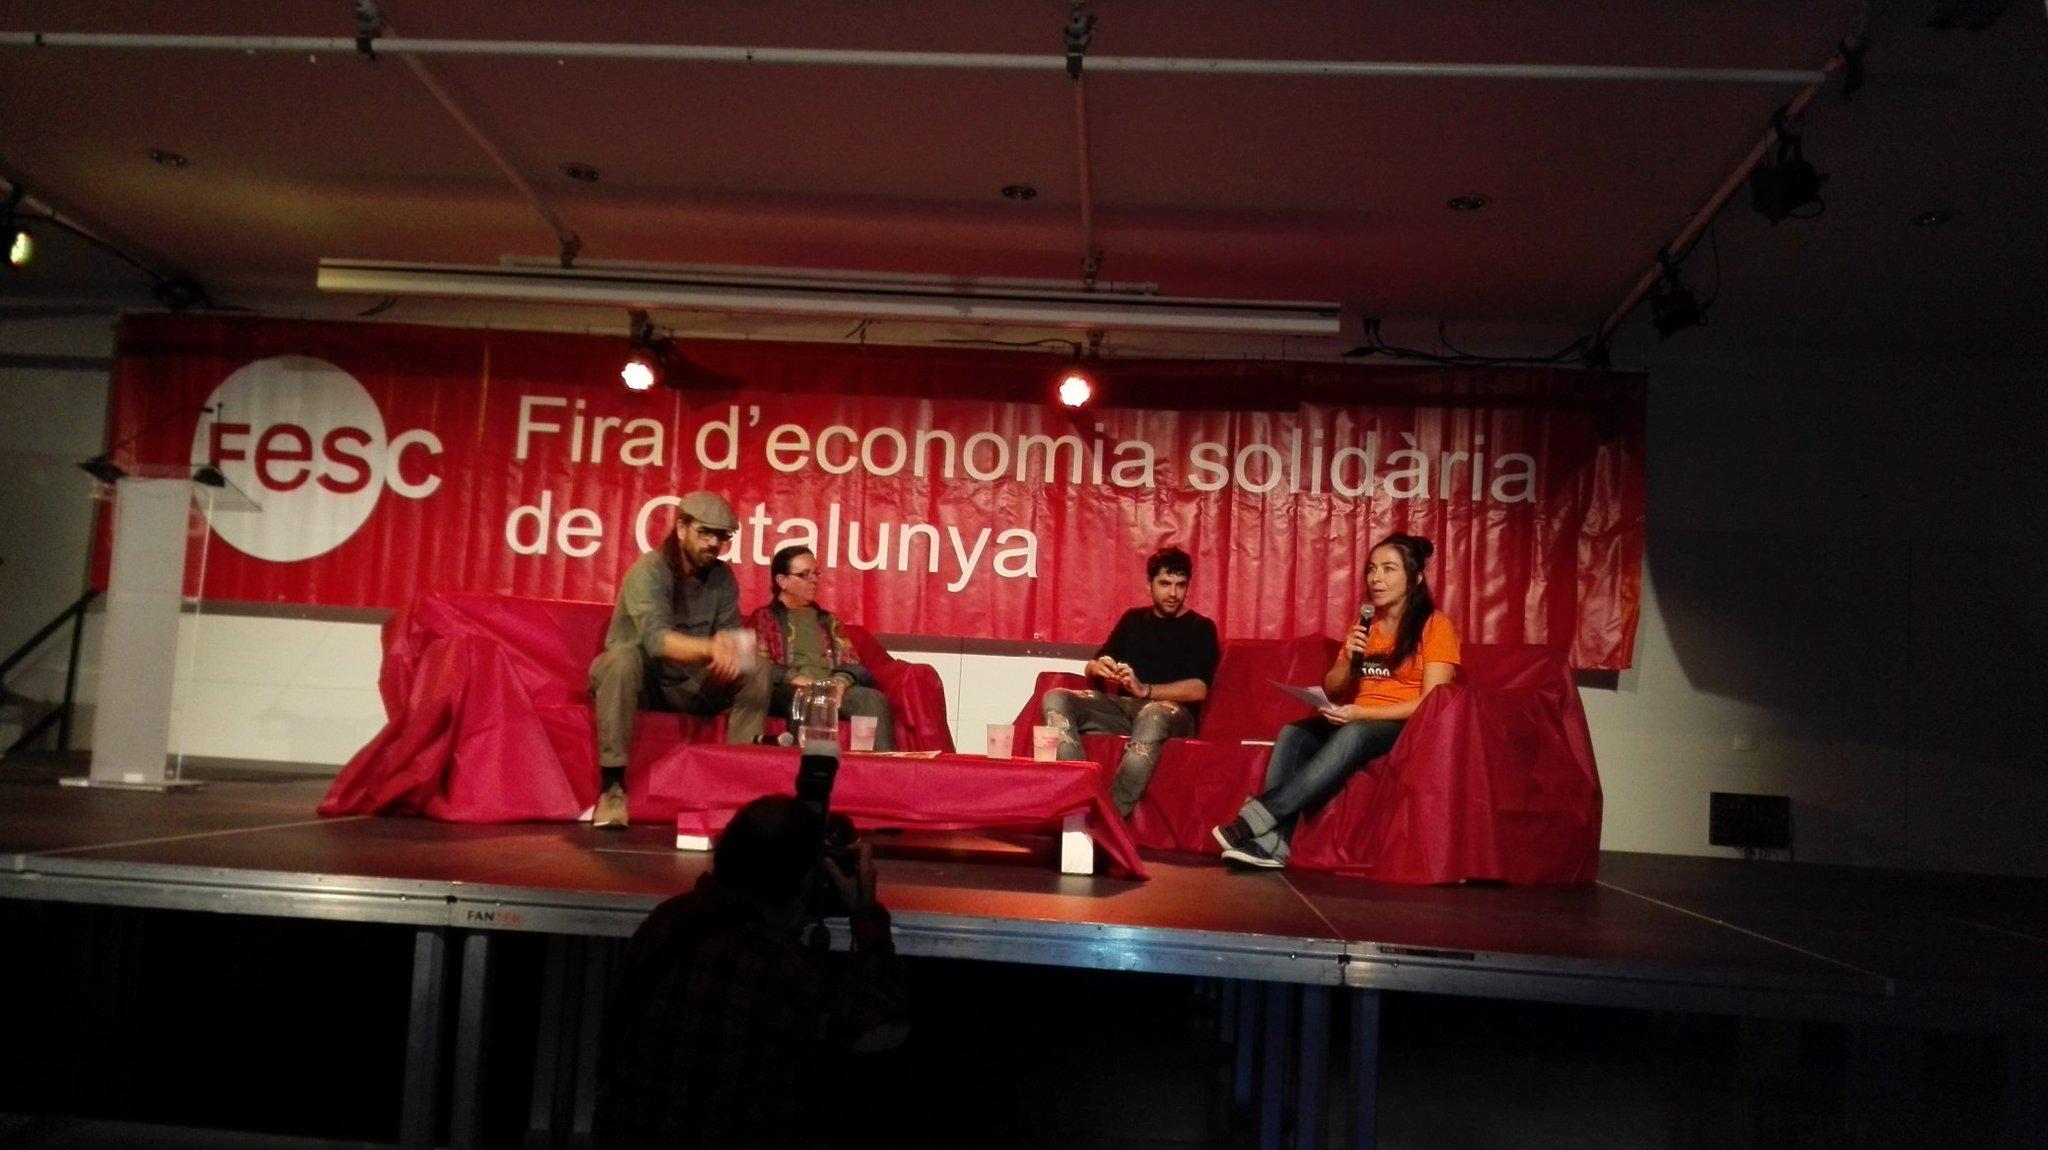 La Fira s' ha inaugurat #FESC2016 ara parlant @AlguerMiquel https://t.co/BEsFU250jb